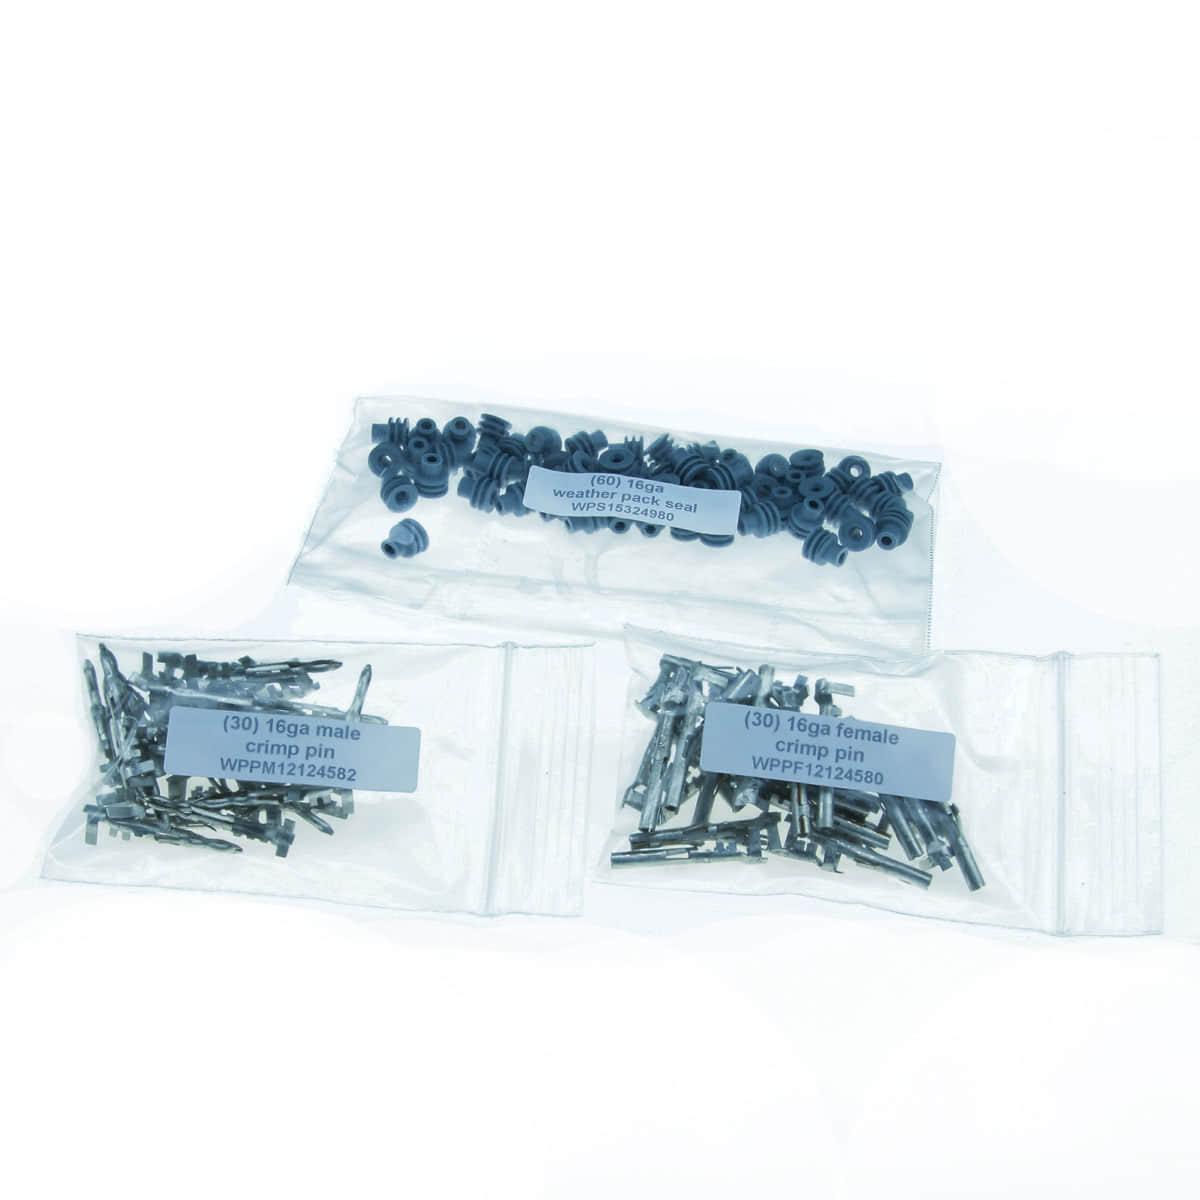 MegaSquirt Wiring Harnesses & Wire Bundles